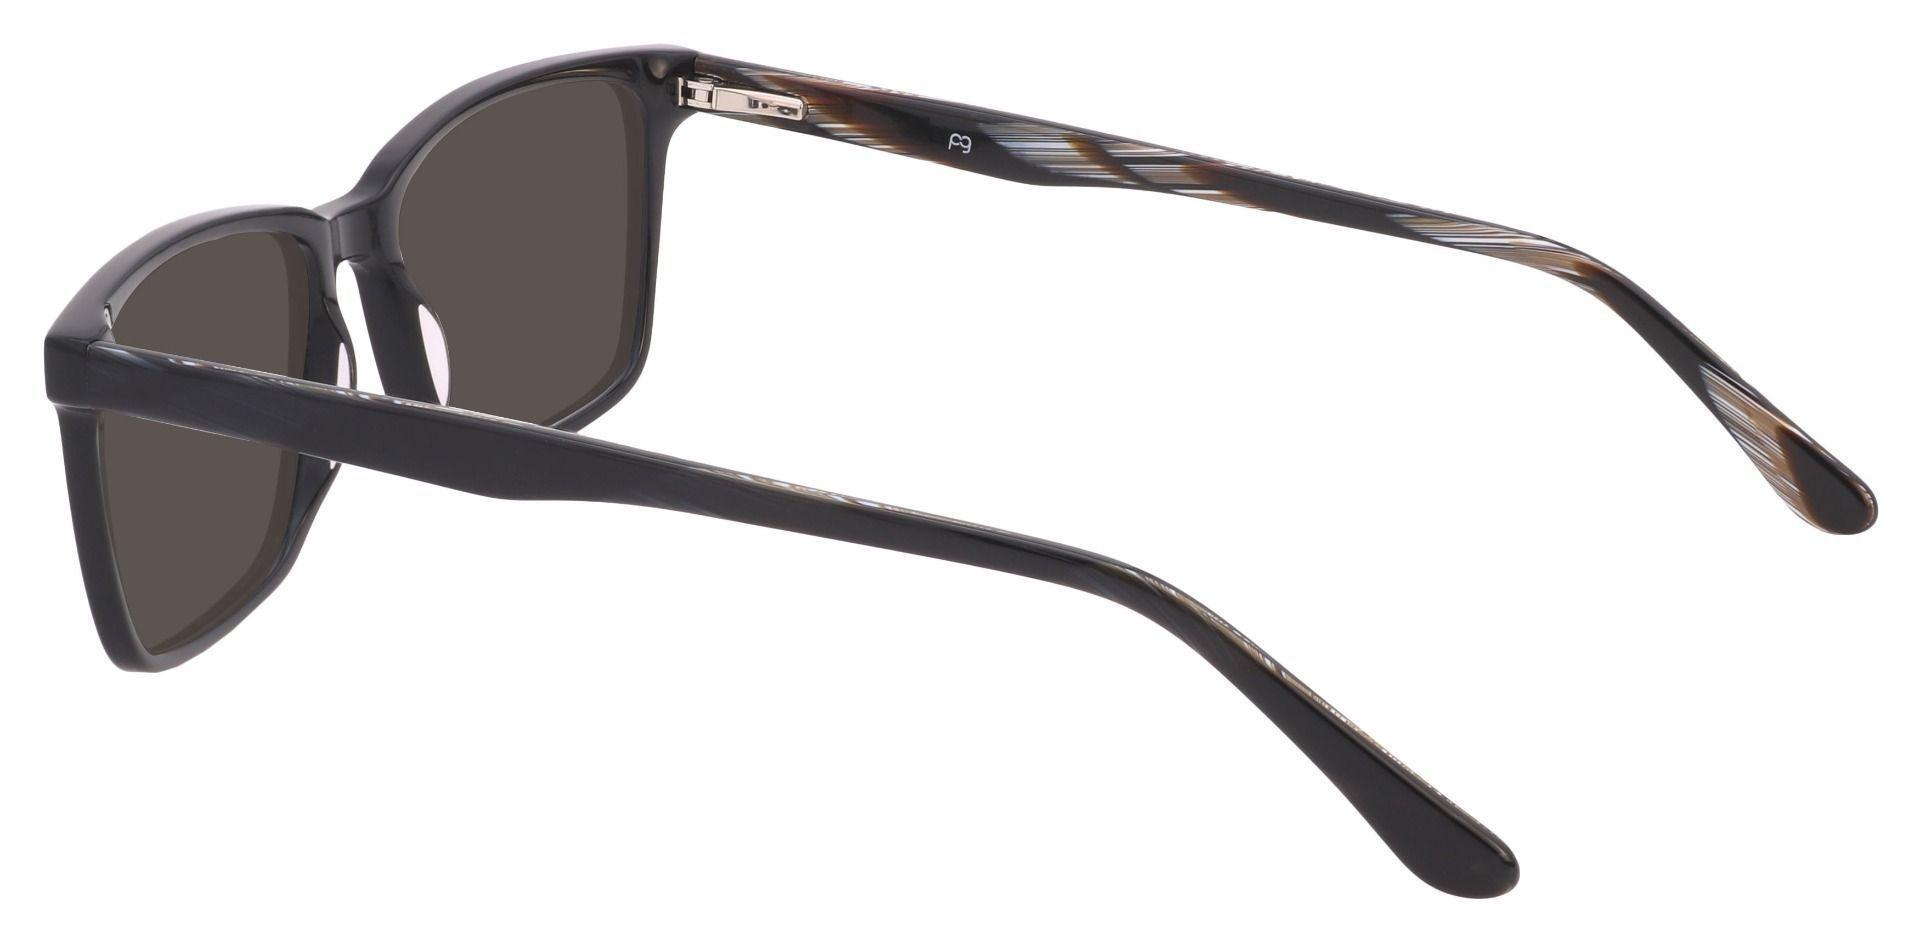 Venice Rectangle Non-Rx Sunglasses - Black Frame With Gray Lenses